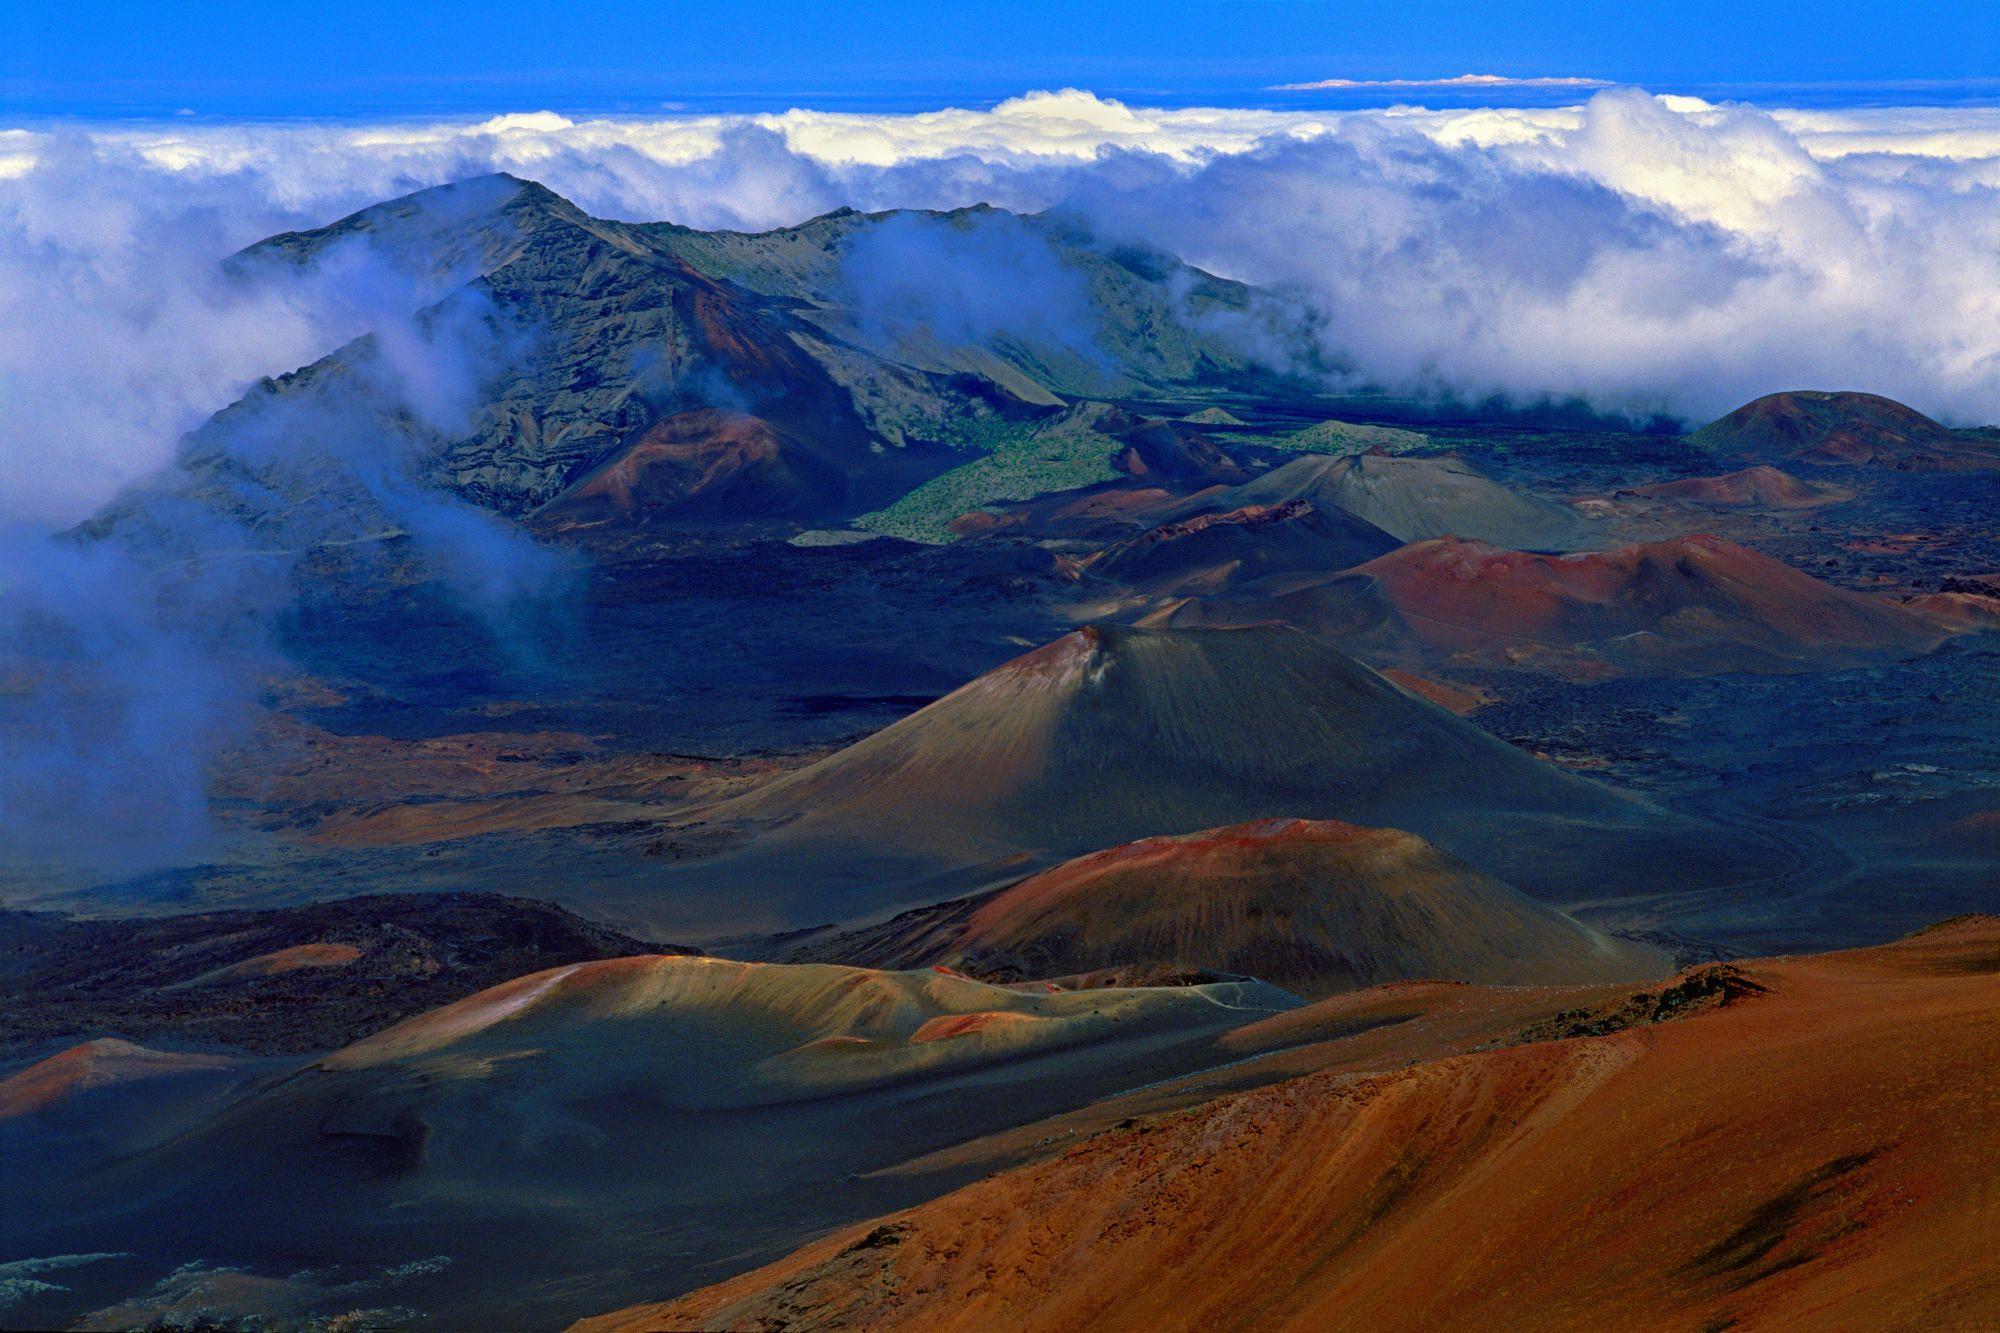 Landscape nature hd my fantasyland pinterest hawaii landscape nature hd publicscrutiny Gallery